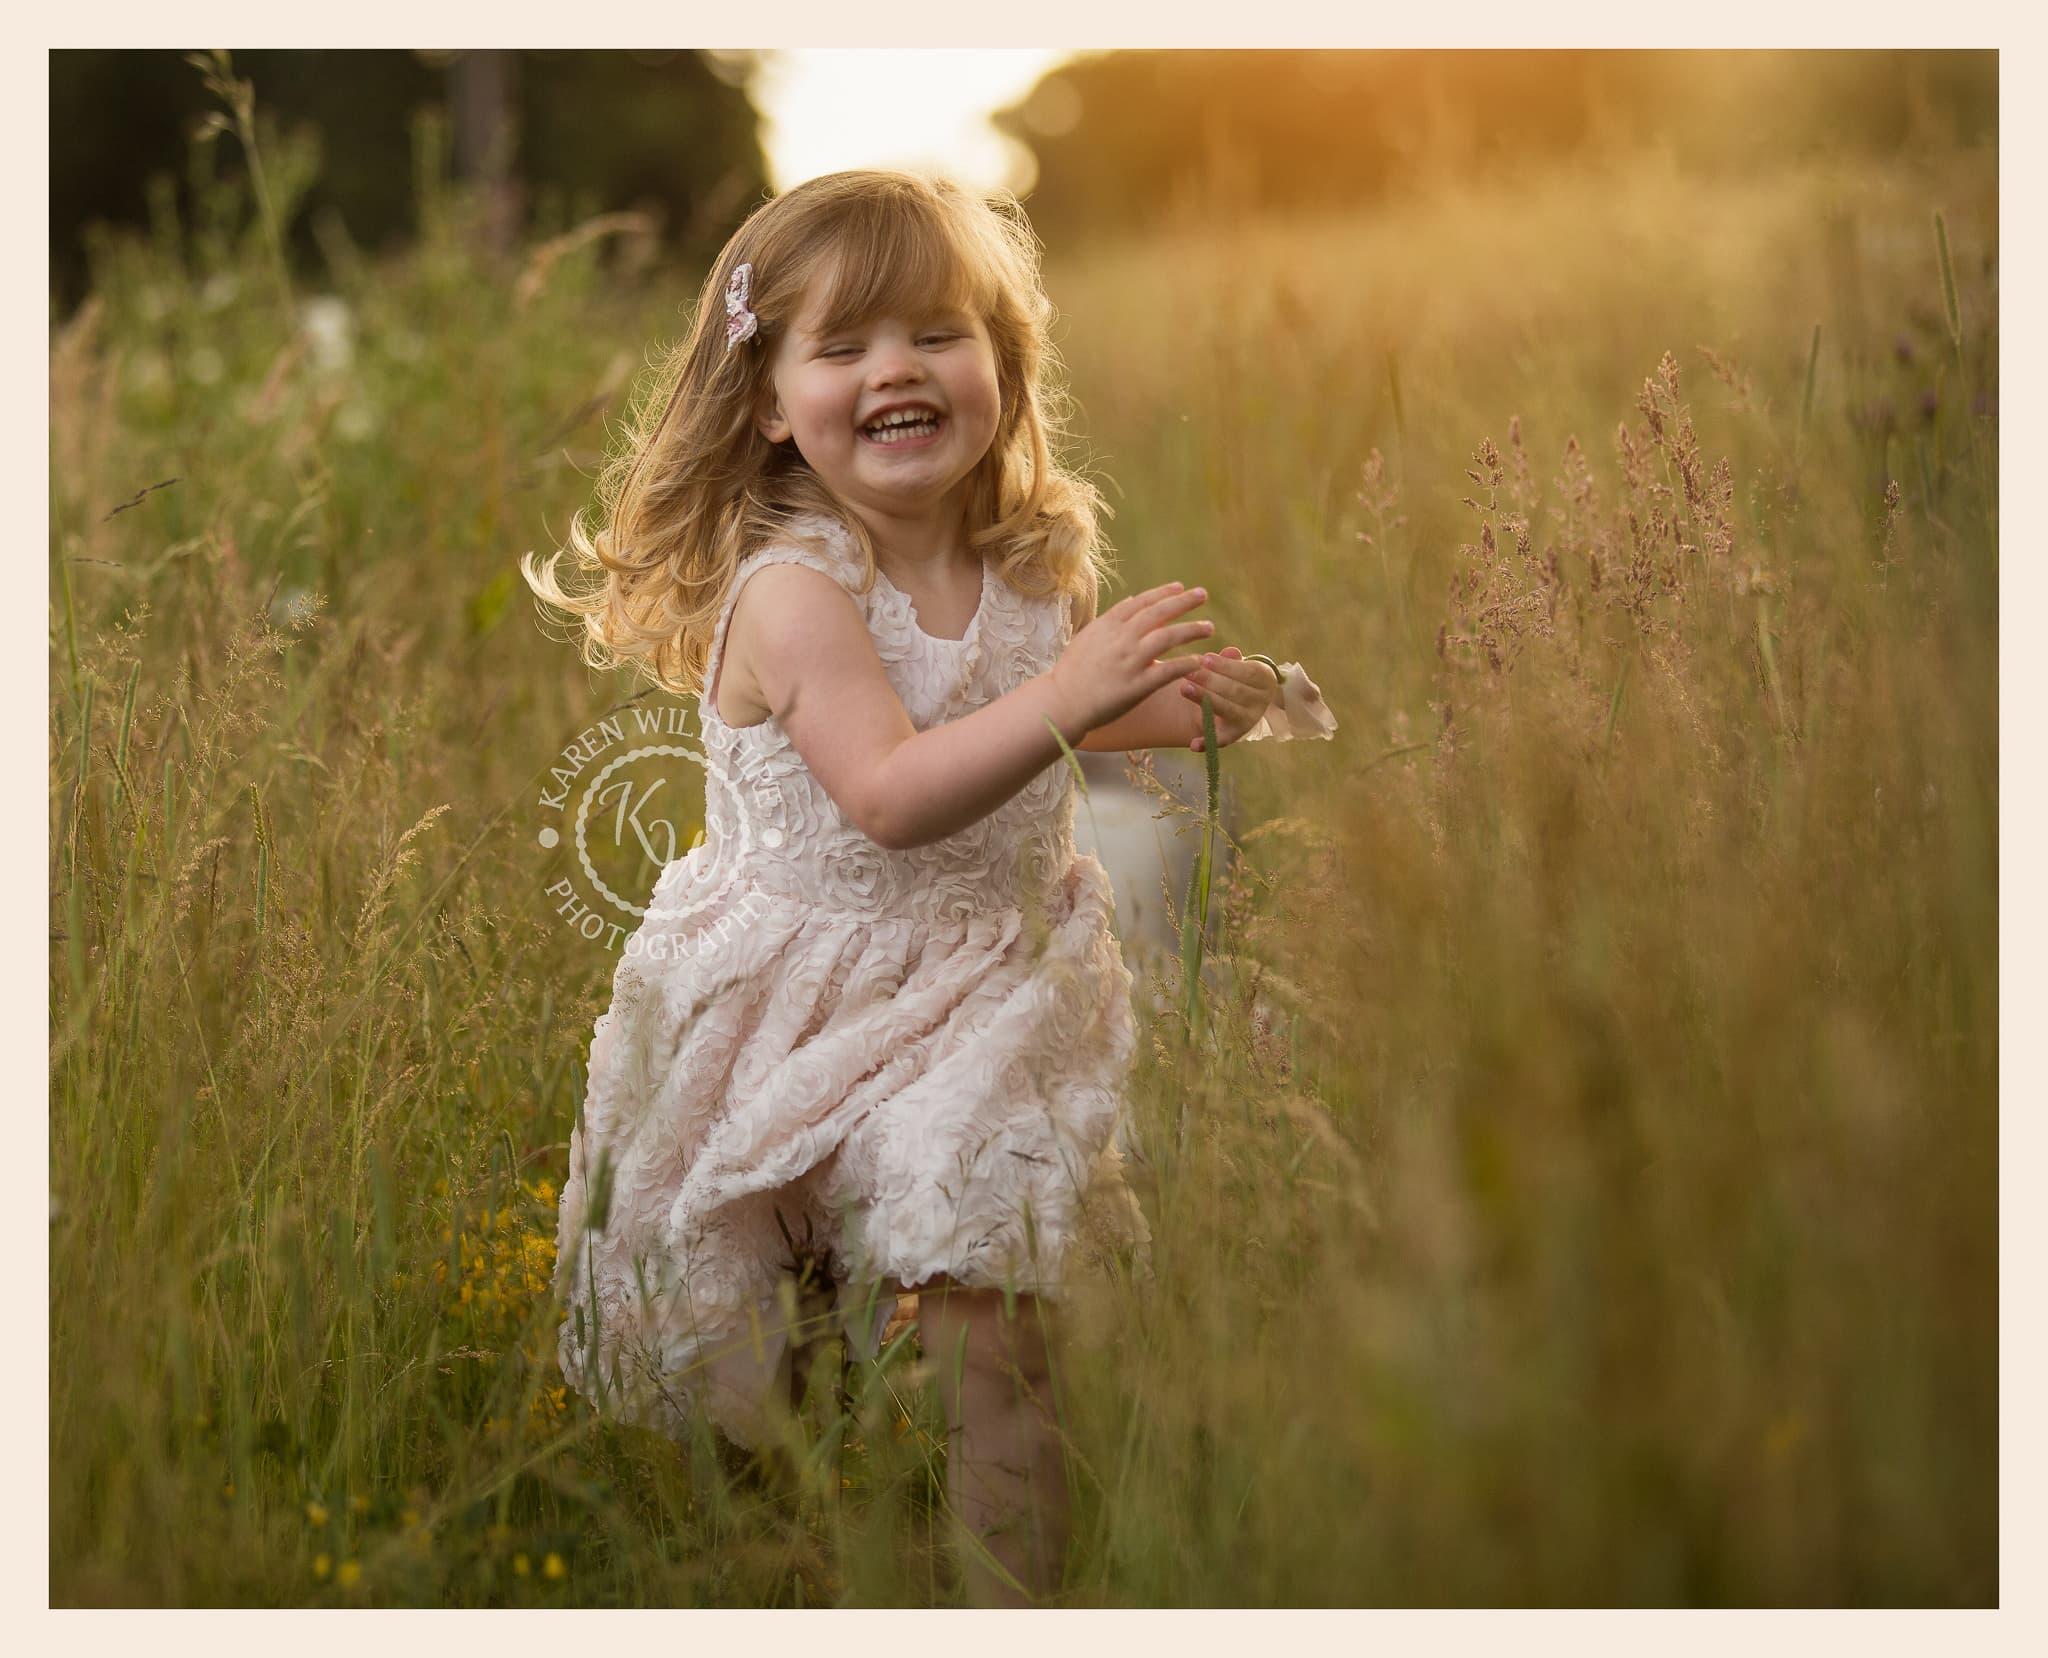 Girl running in long grass